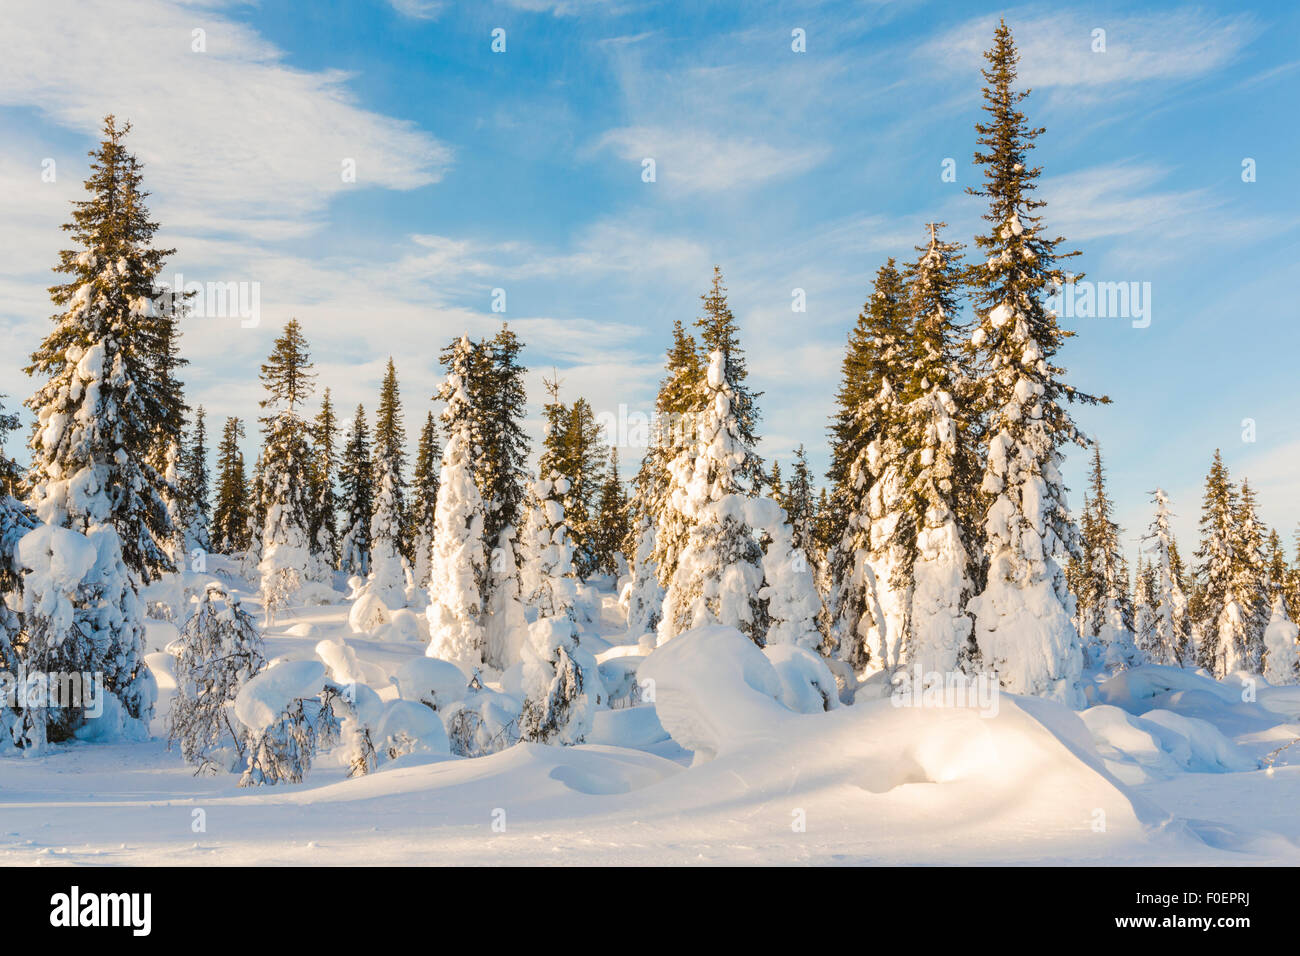 Snowy spruces and blue sky, Gällivare, Swedish lapland, Sweden Stock Photo